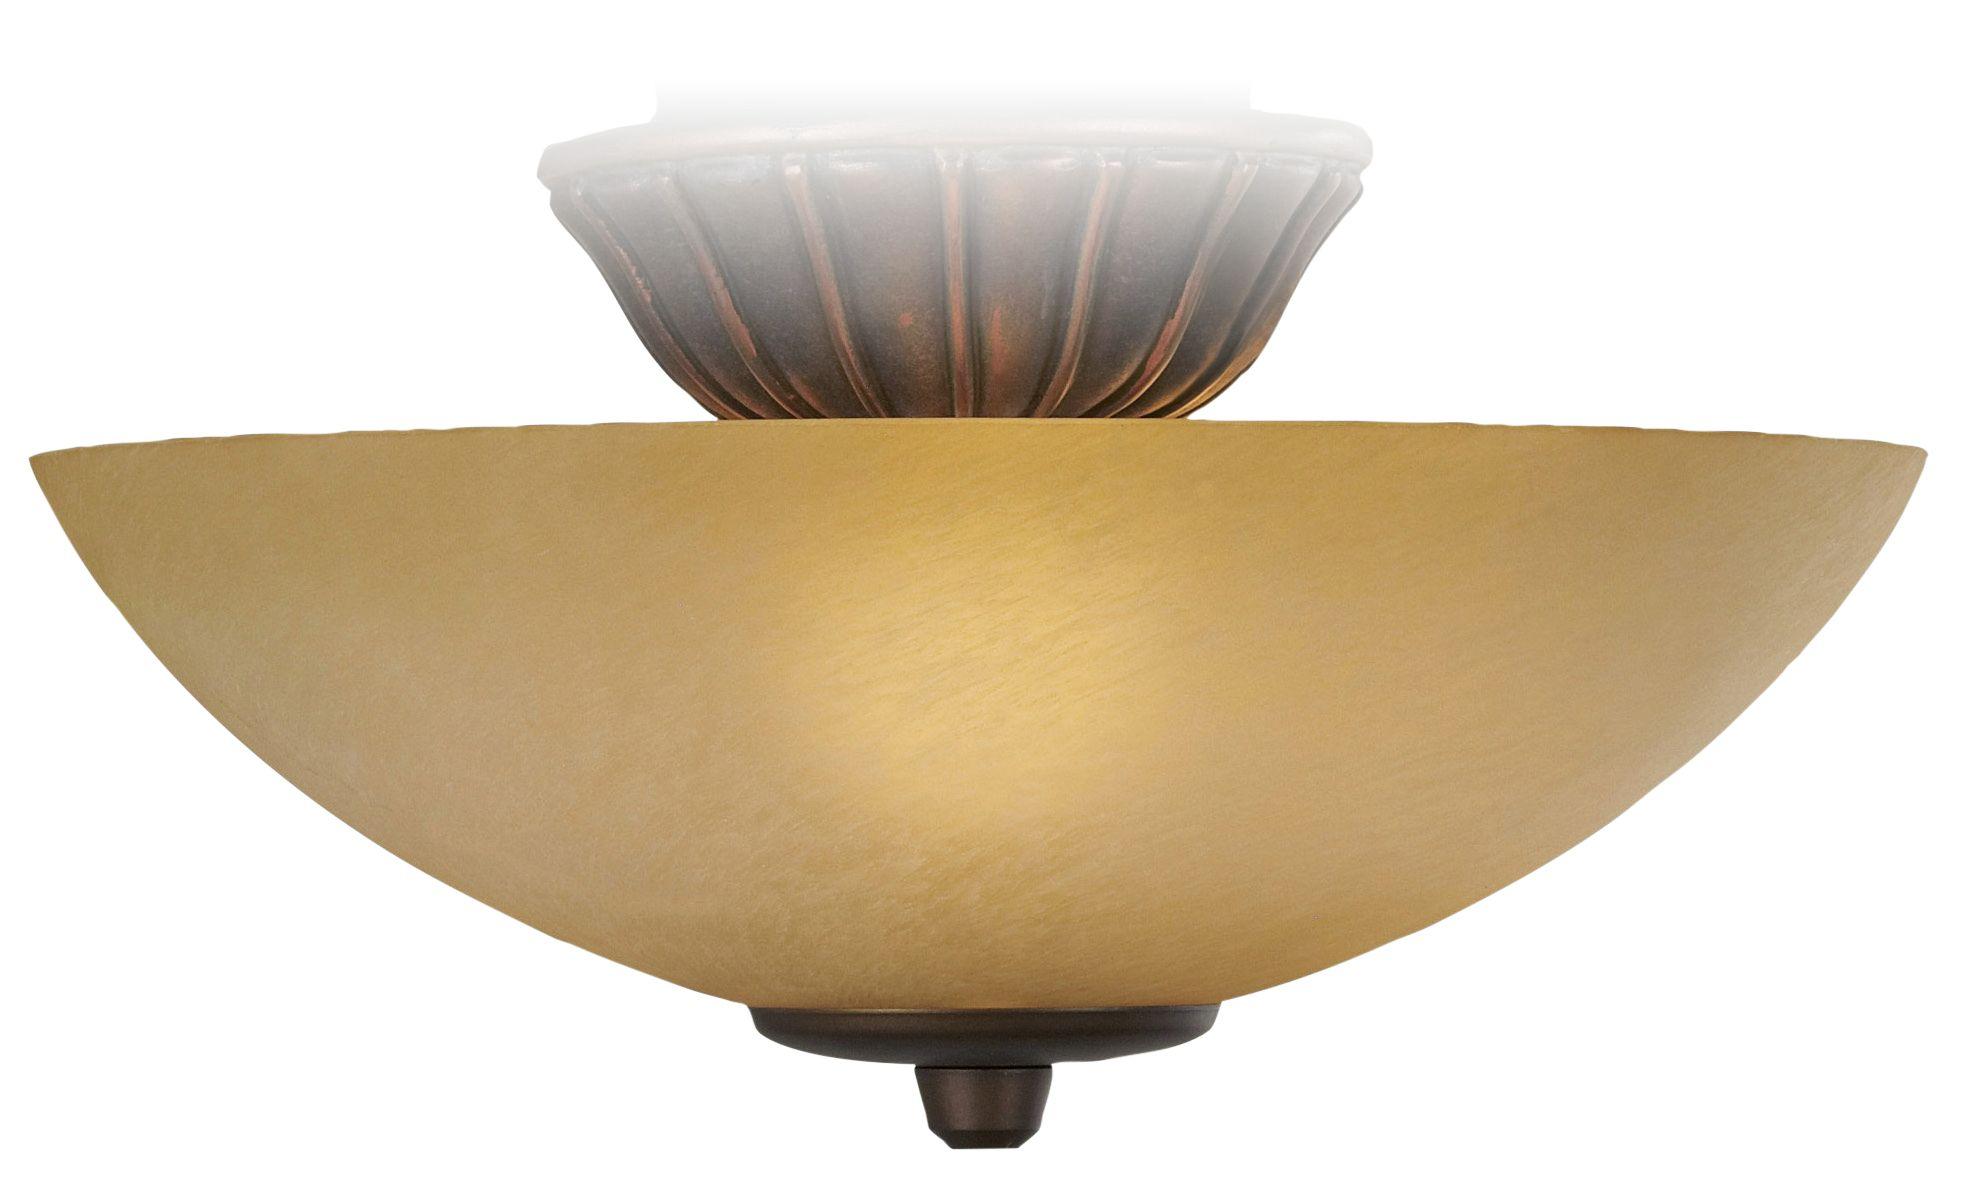 Scavo Glass Pull Chain Ceiling Fan Light Kit